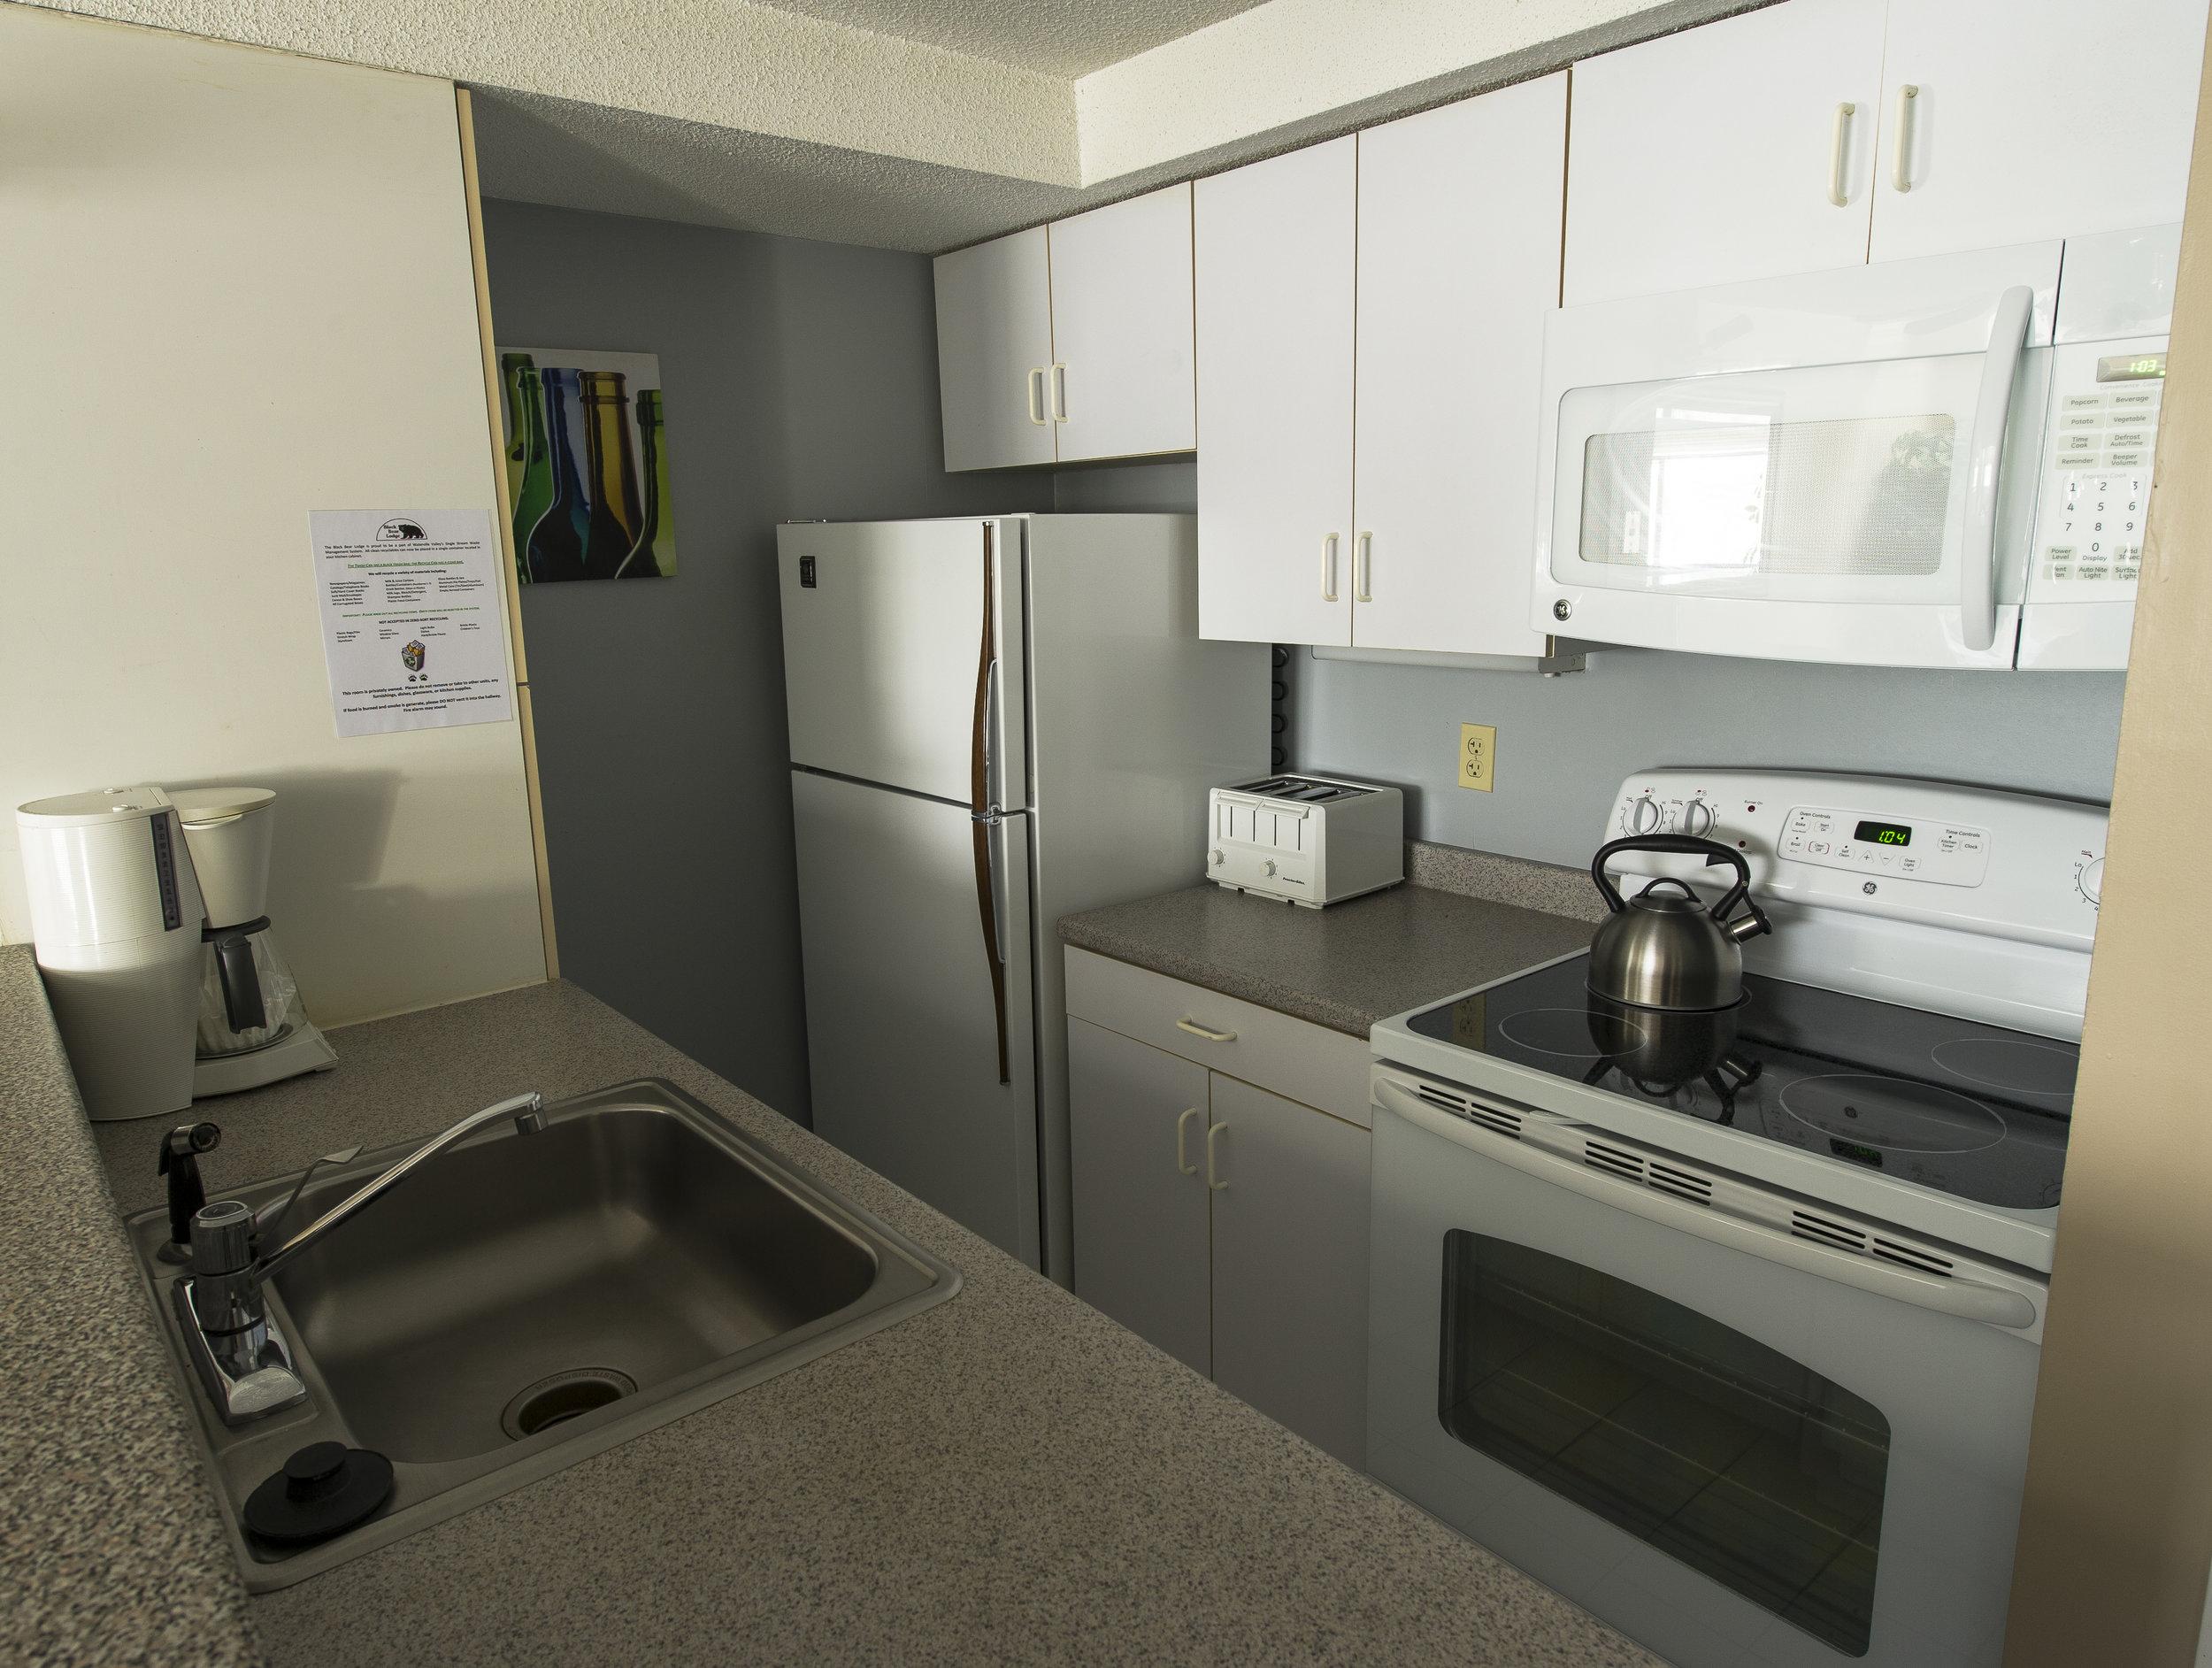 Kitchen at the Black Bear Lodge